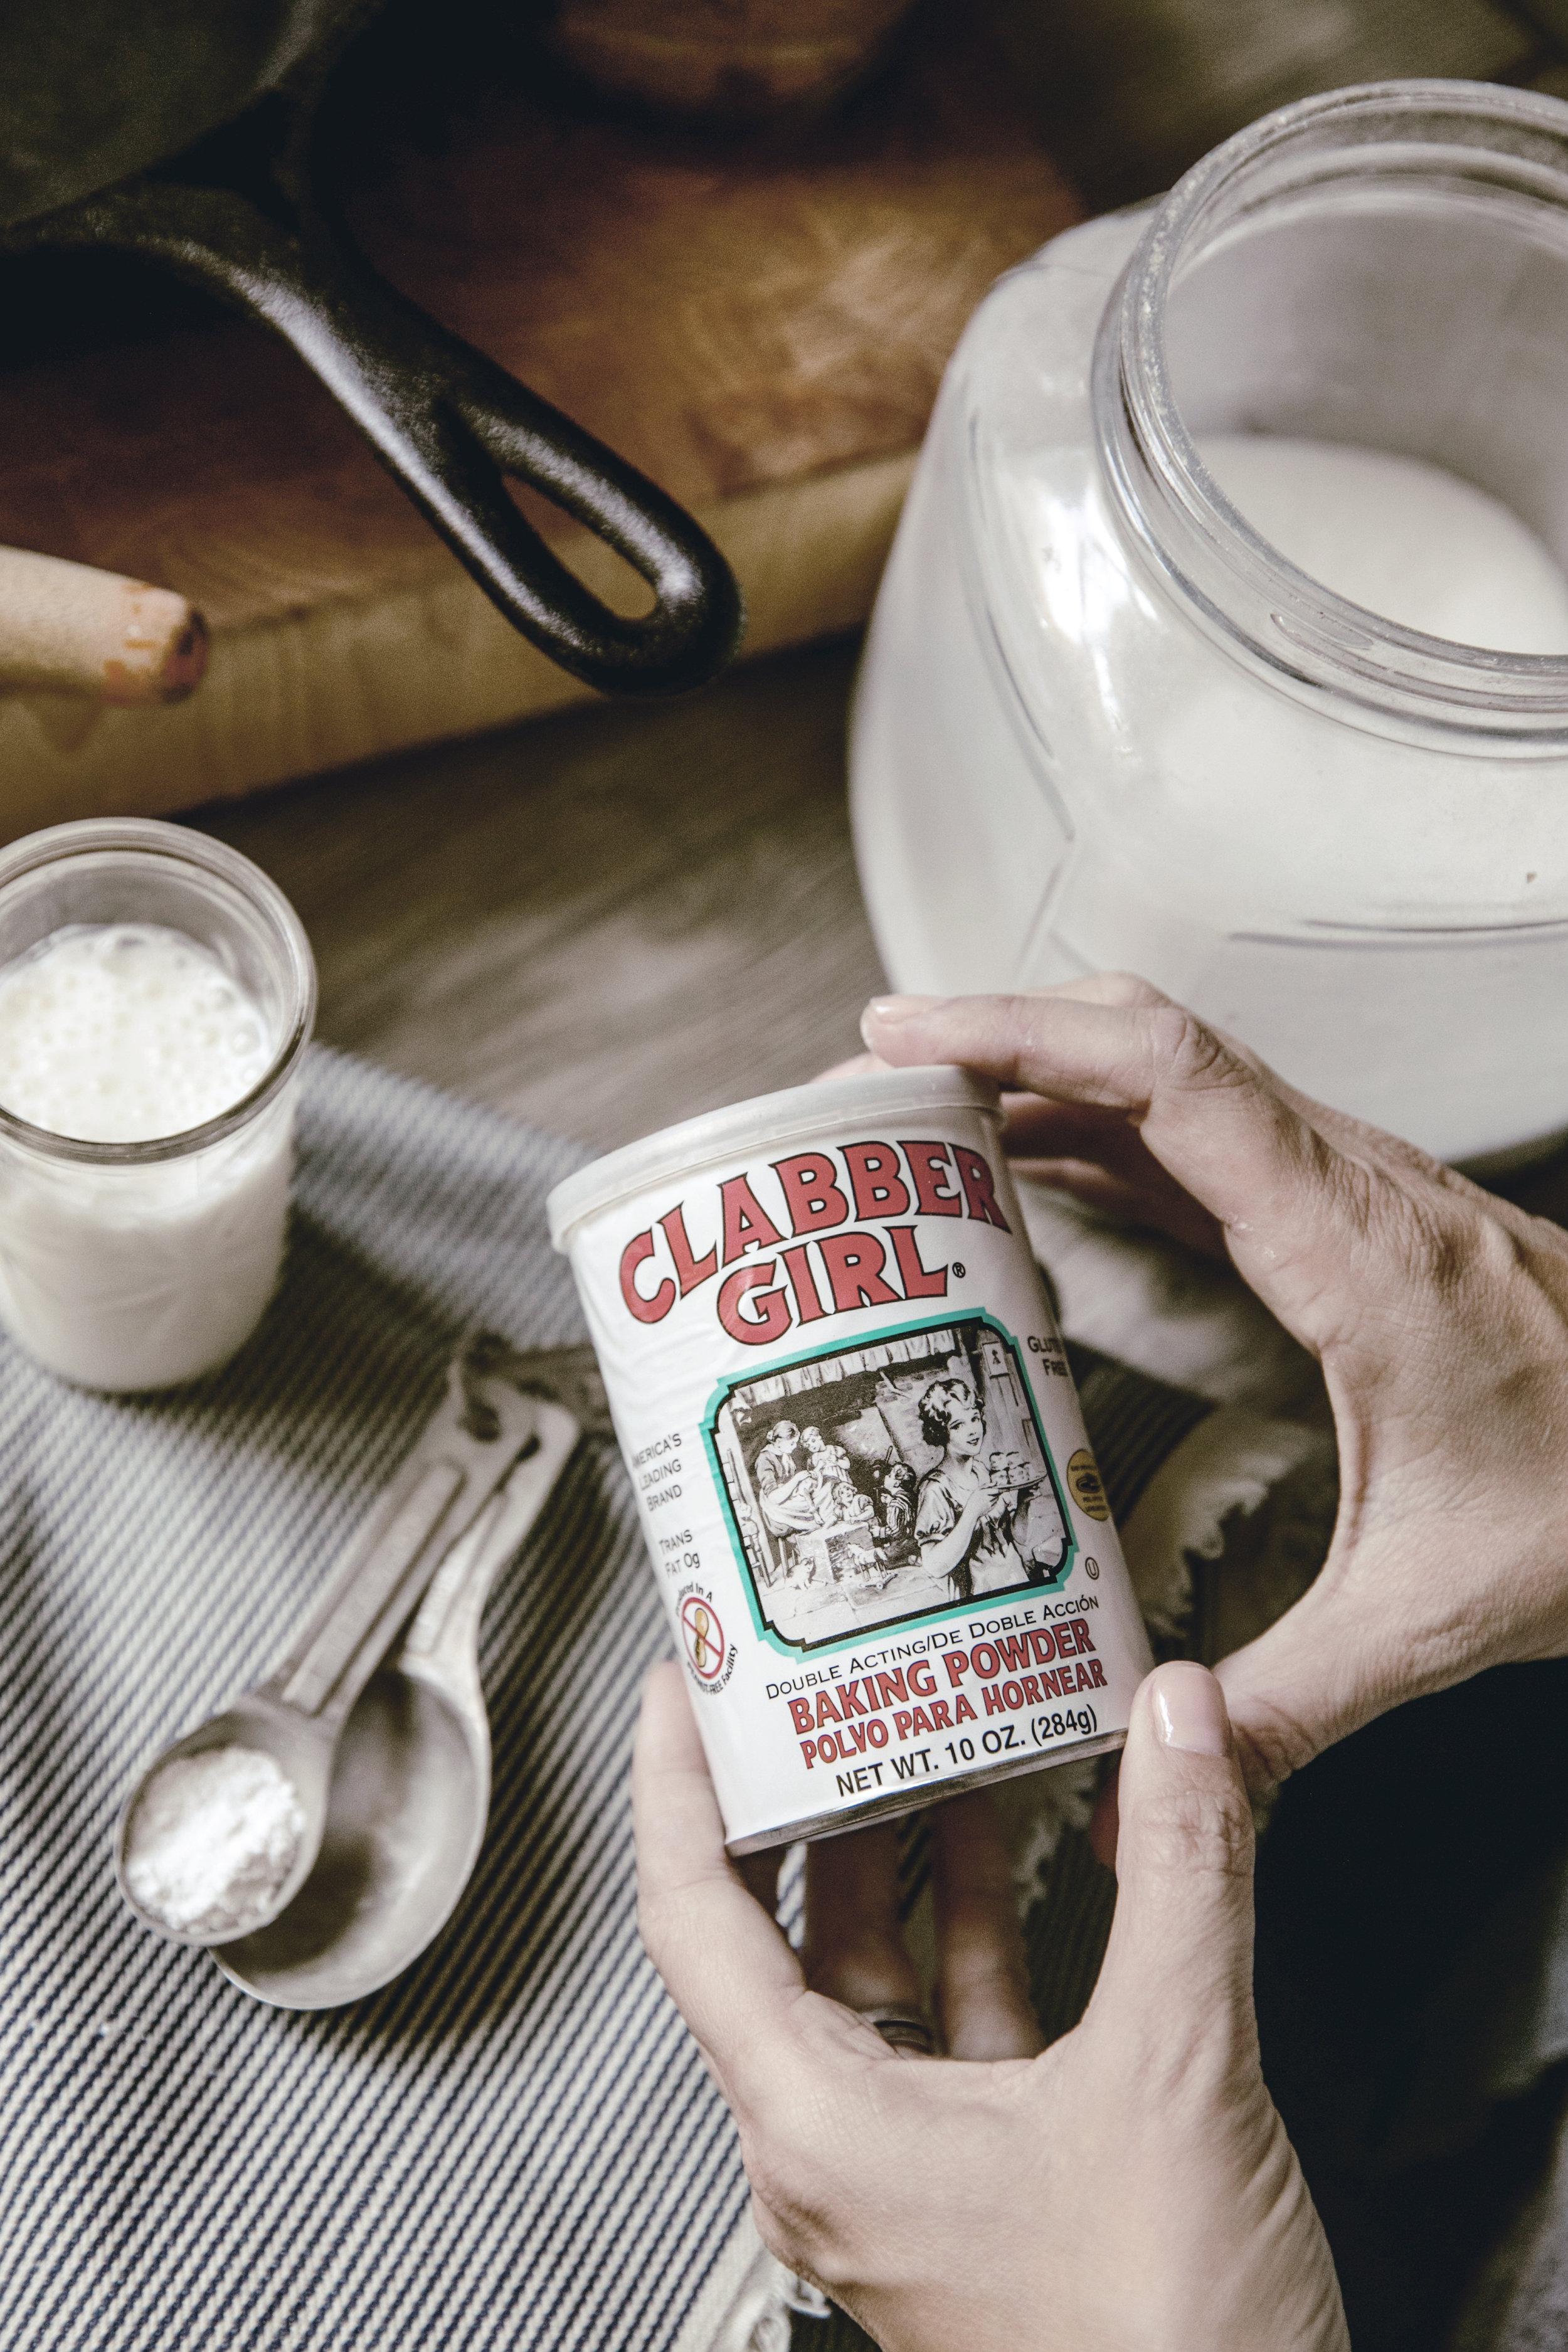 Apple Skillet Cobbler clabber girl baking powder